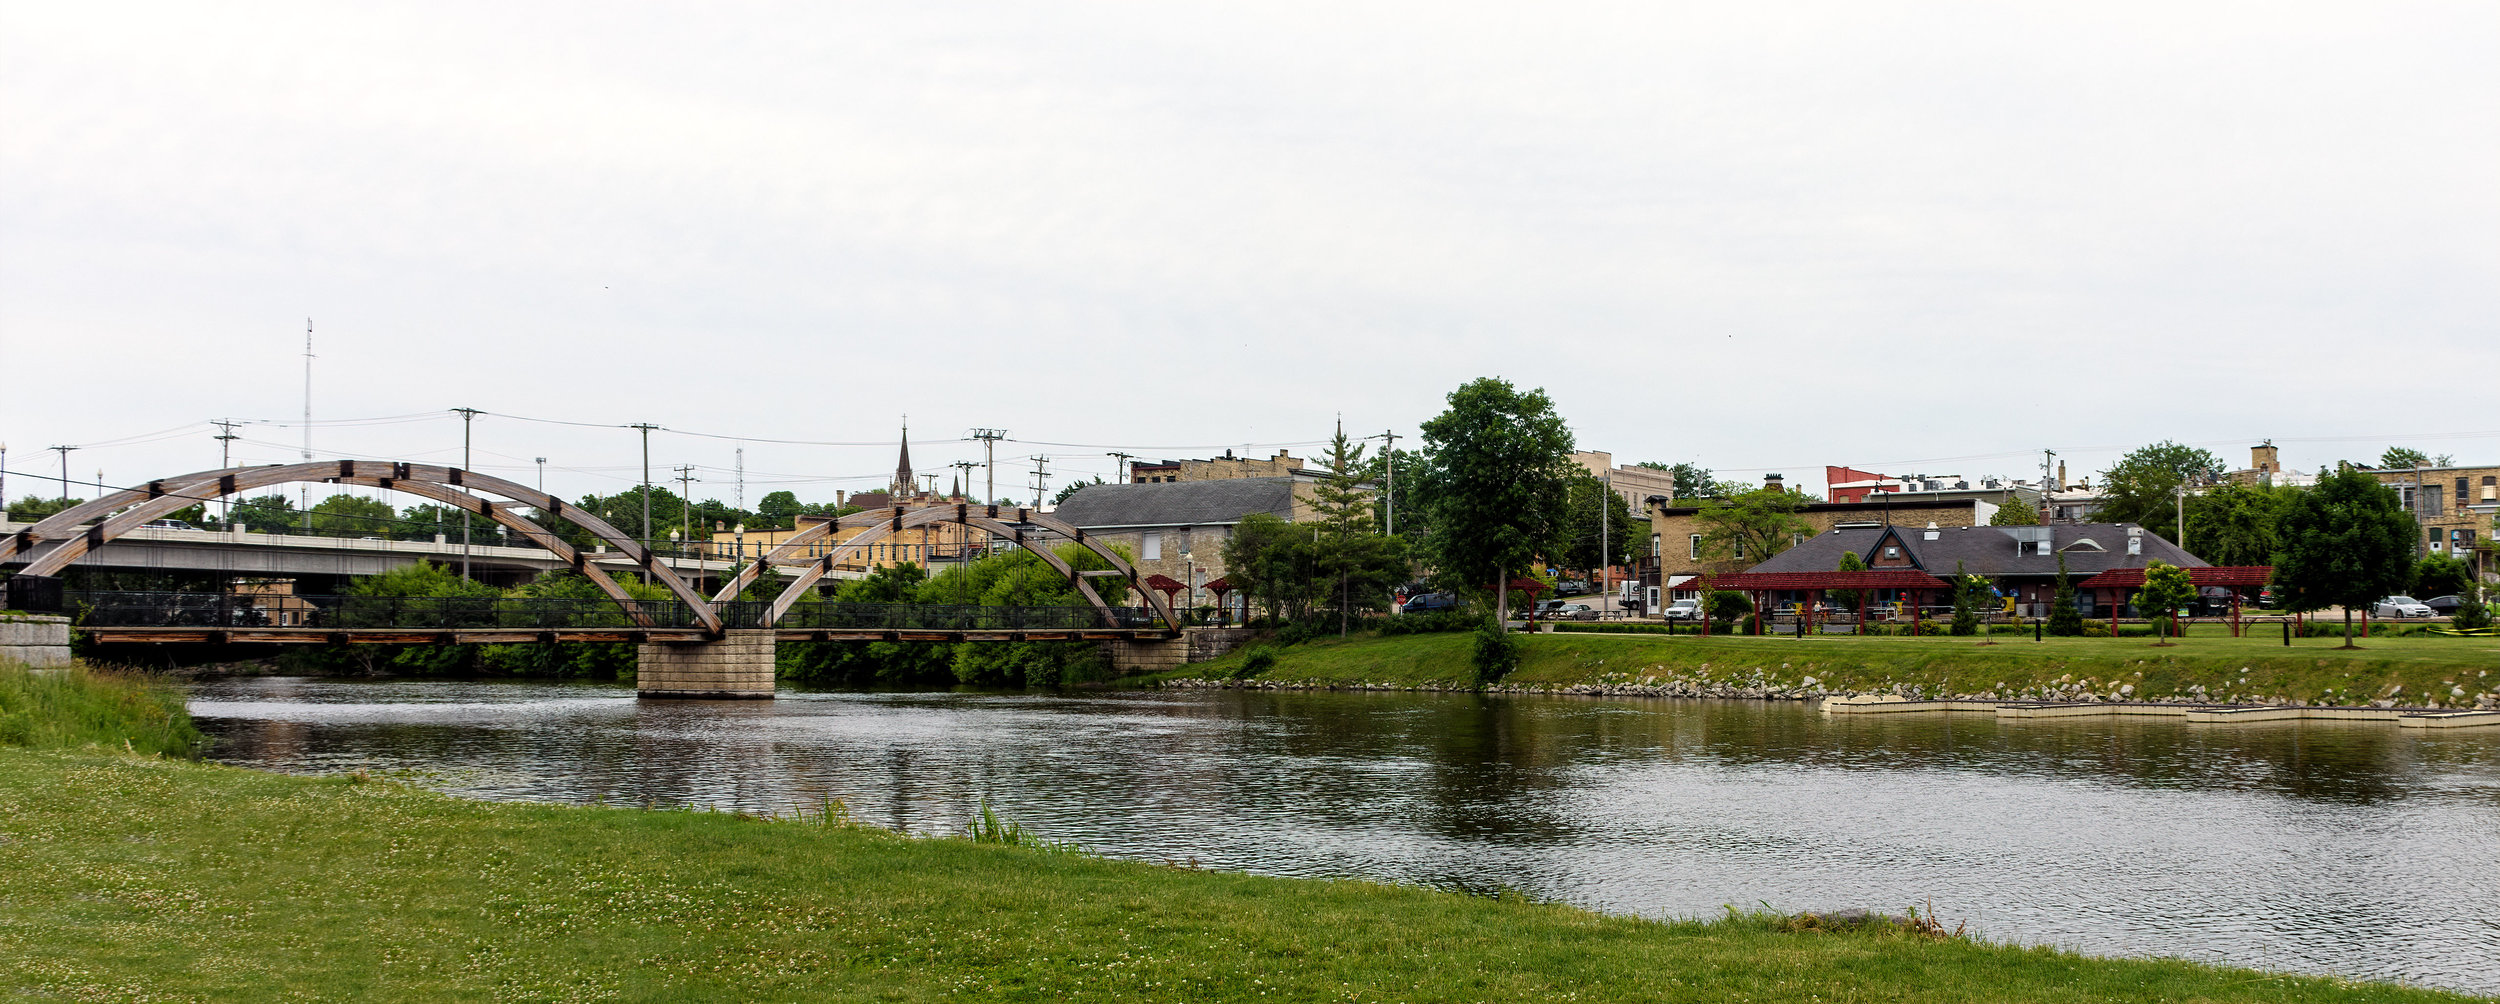 Rock River Looking East